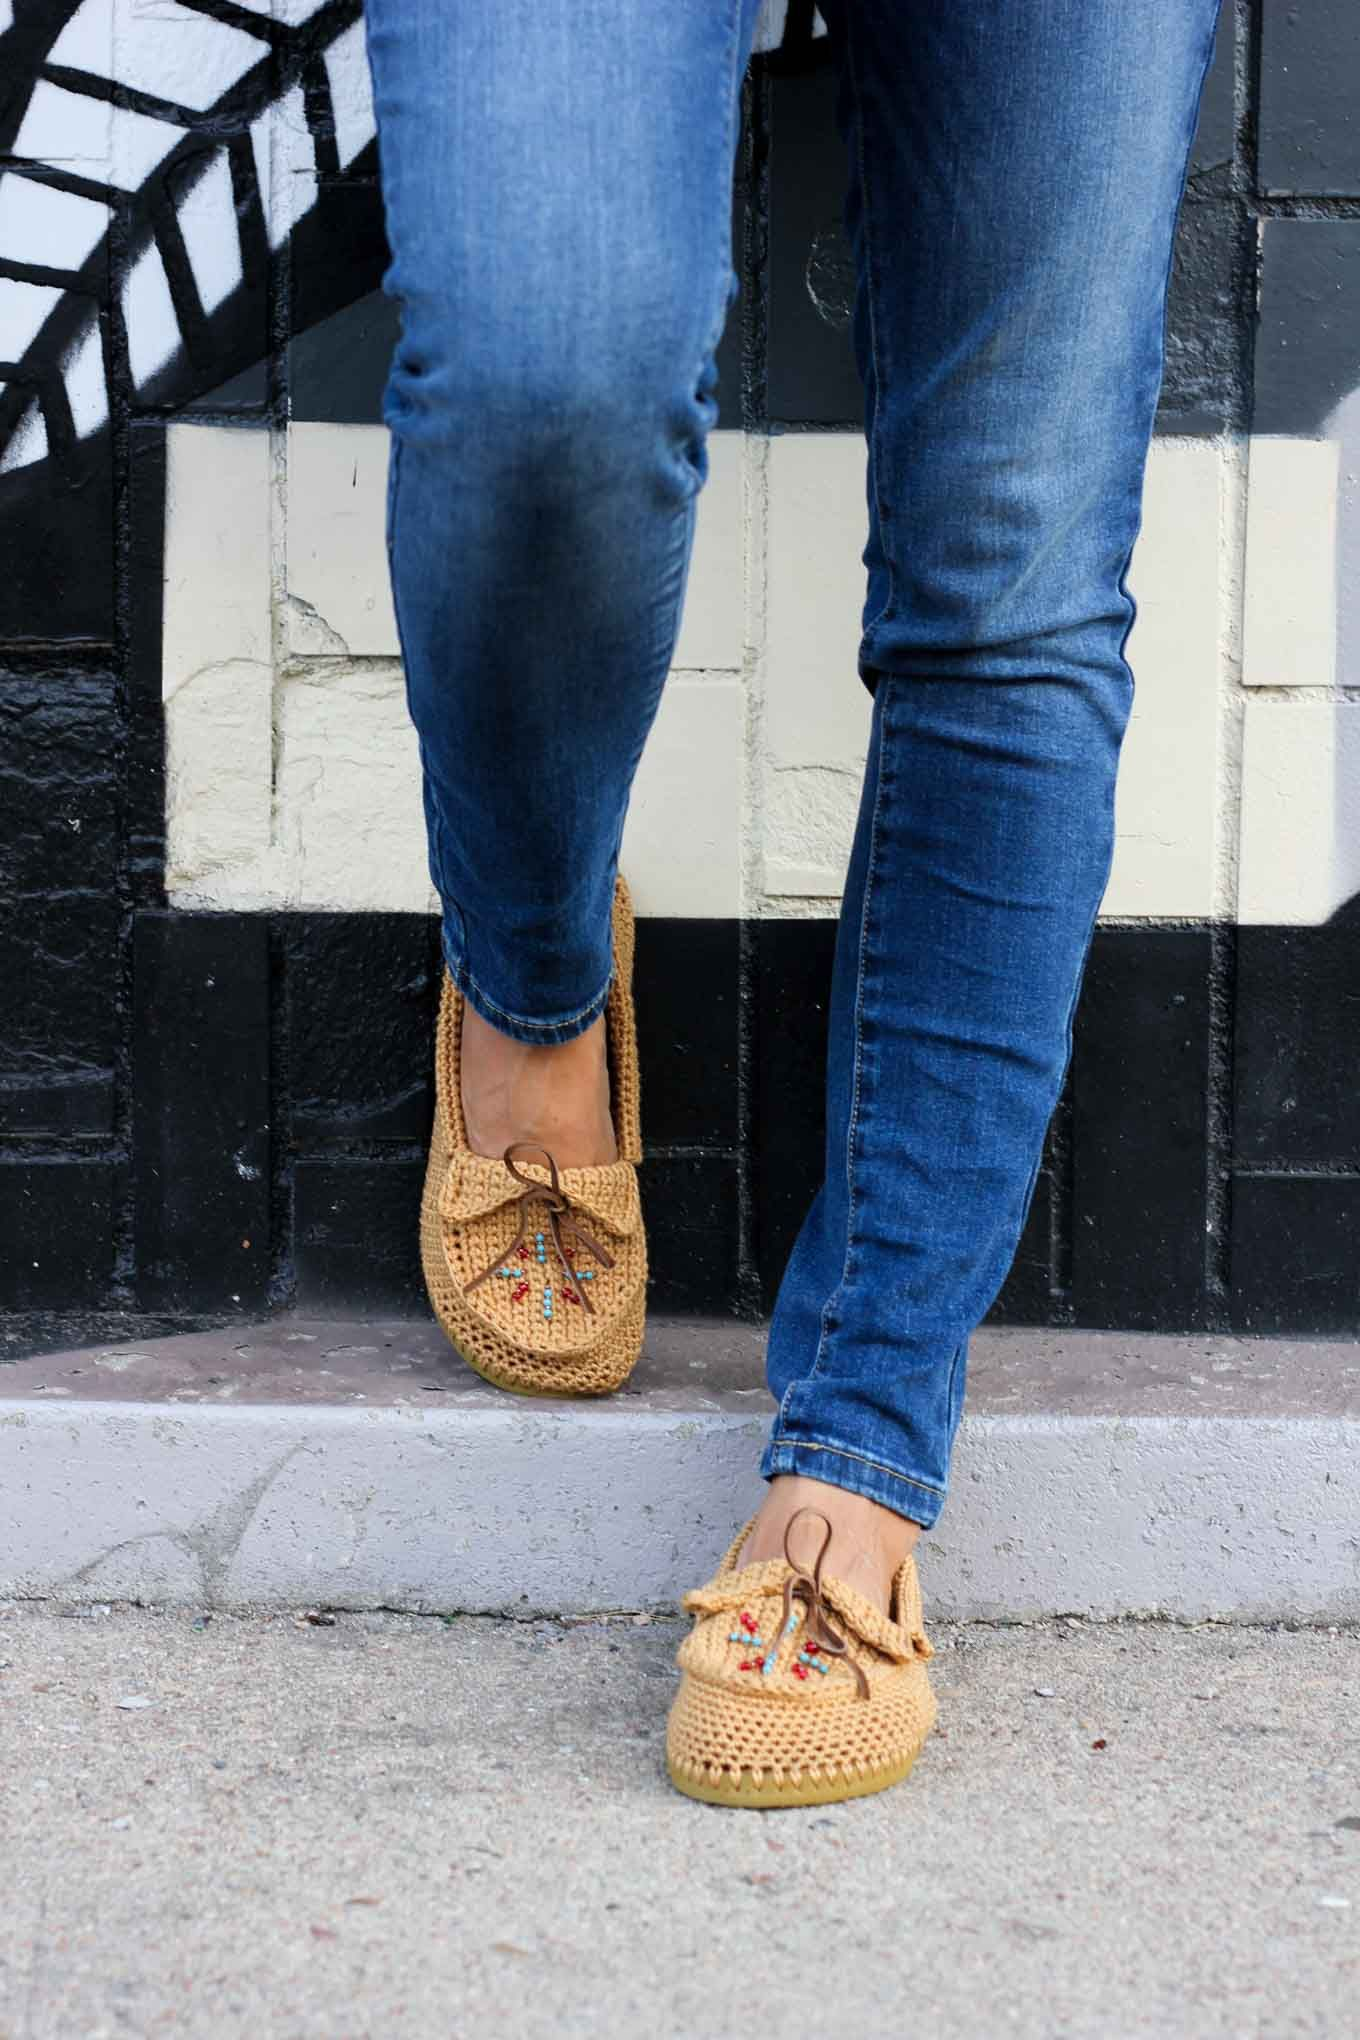 Crochet Shoes With Flip Flop Soles - Free Moccasin Pattern! | Lion ...